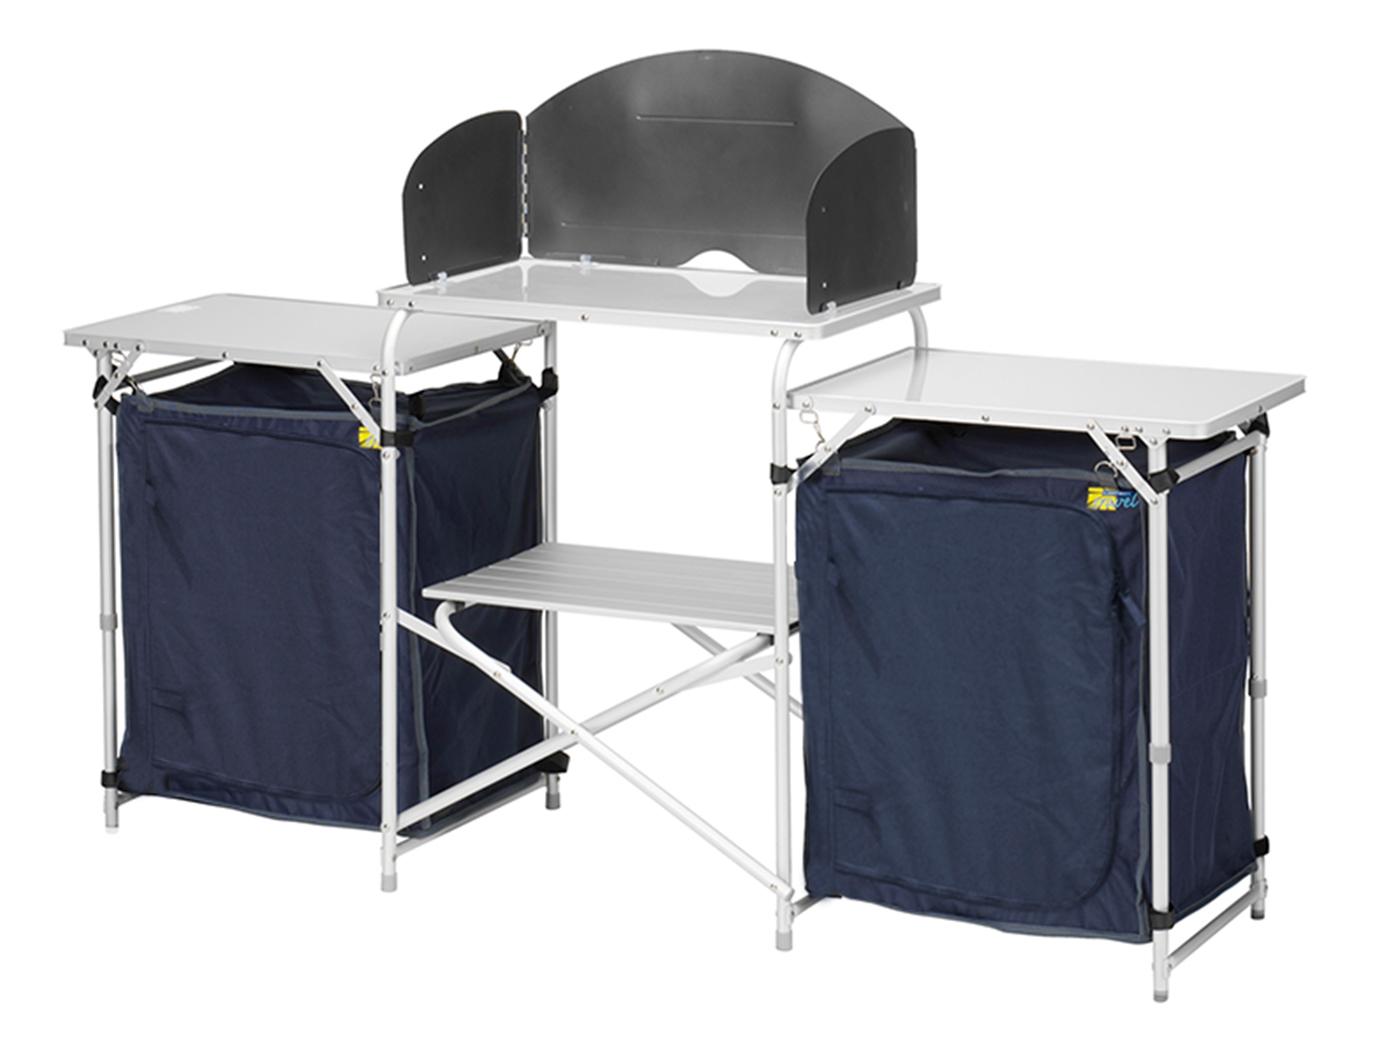 Outdoor Küche Xxl : Xxl campingküche faltbar set mit gaskocher outdoor camping küche